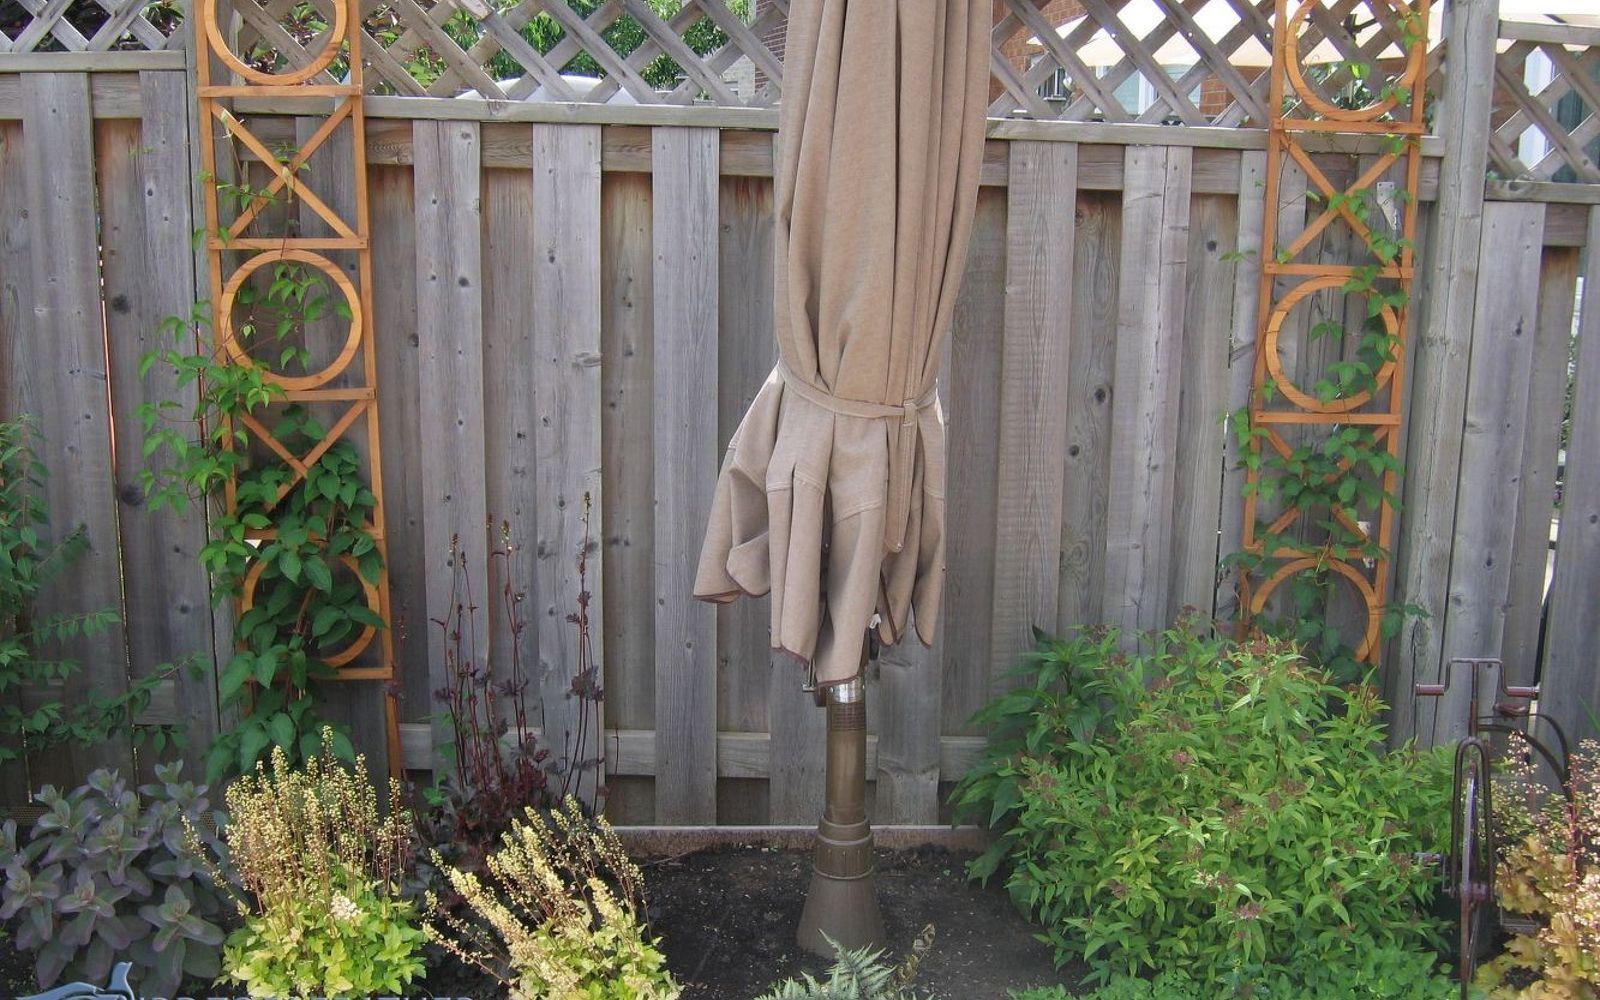 s 17 ways to build a gorgeous garden trellis this summer, gardening, Put wood beams by a boring garden walls